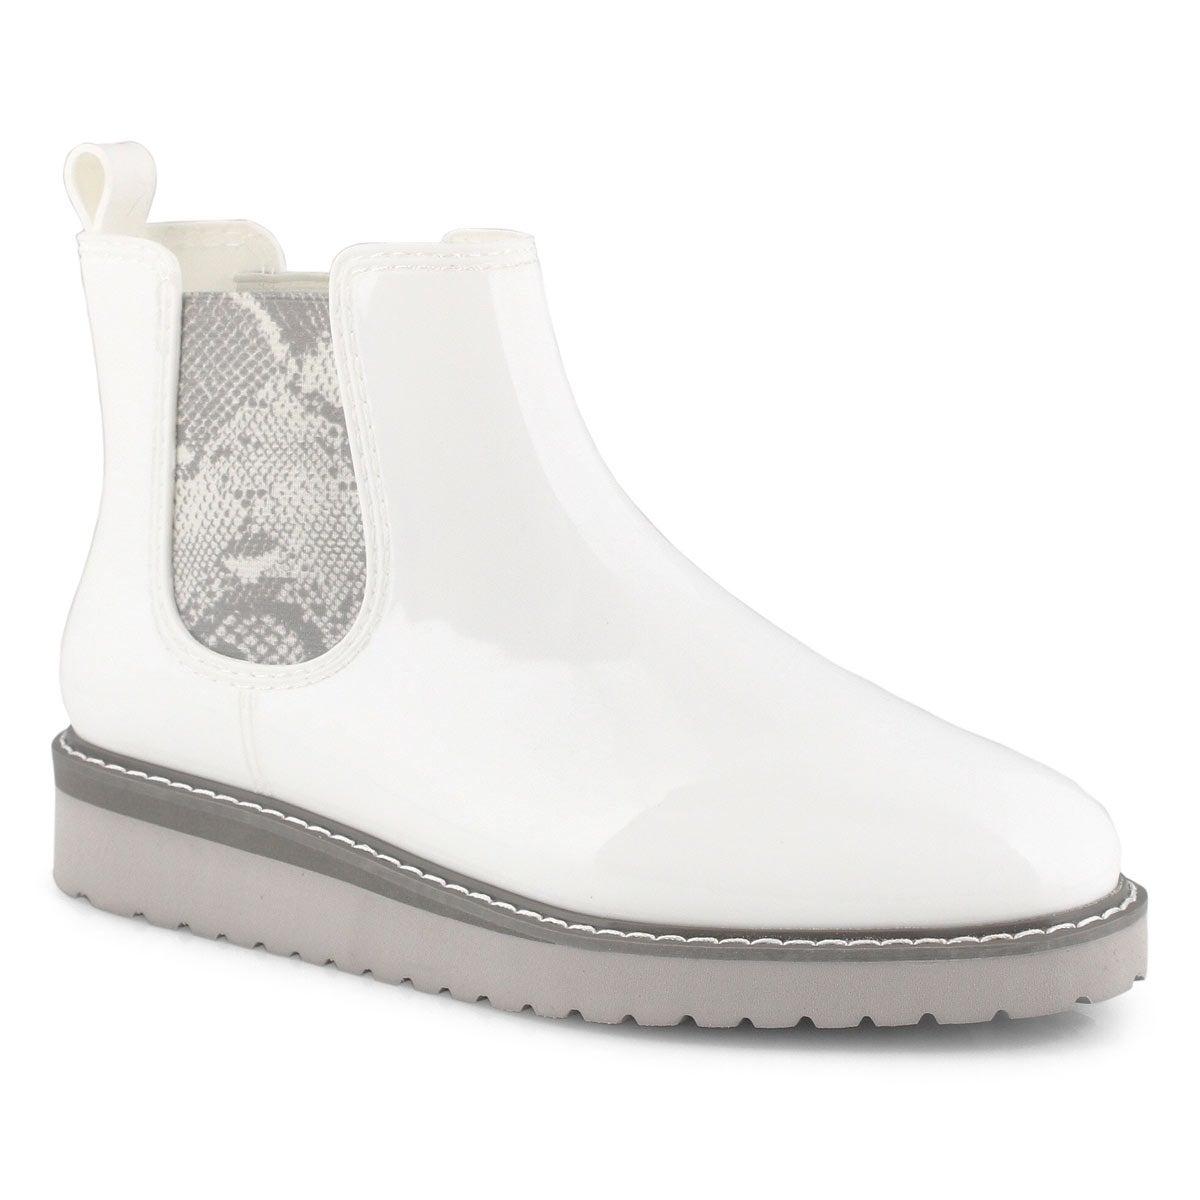 Lds Kensington wht snk wtpf chelsea boot